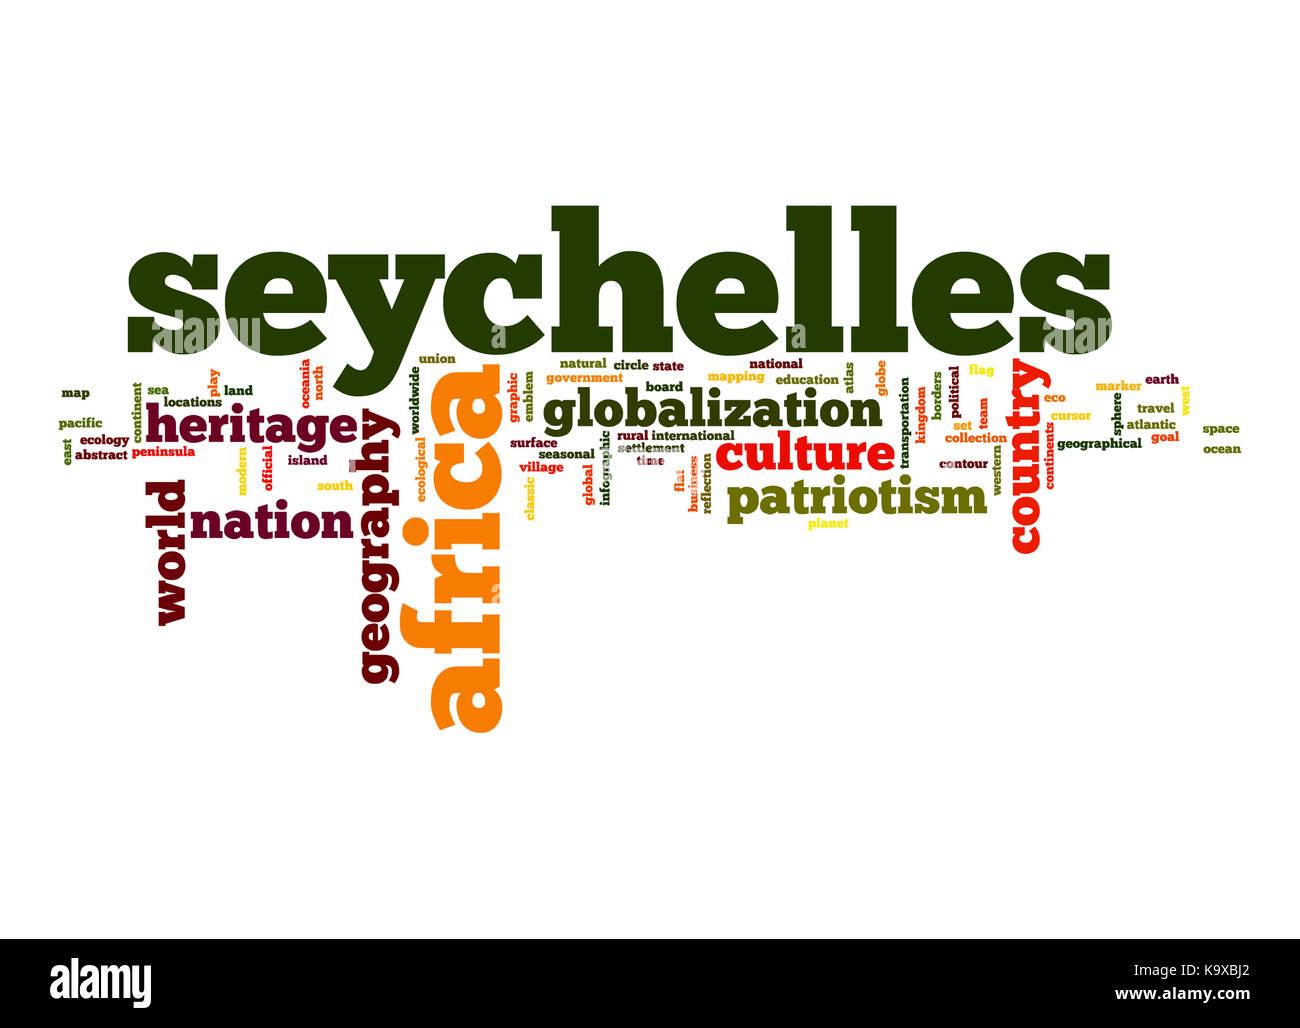 Seychelles word cloud - Stock Image